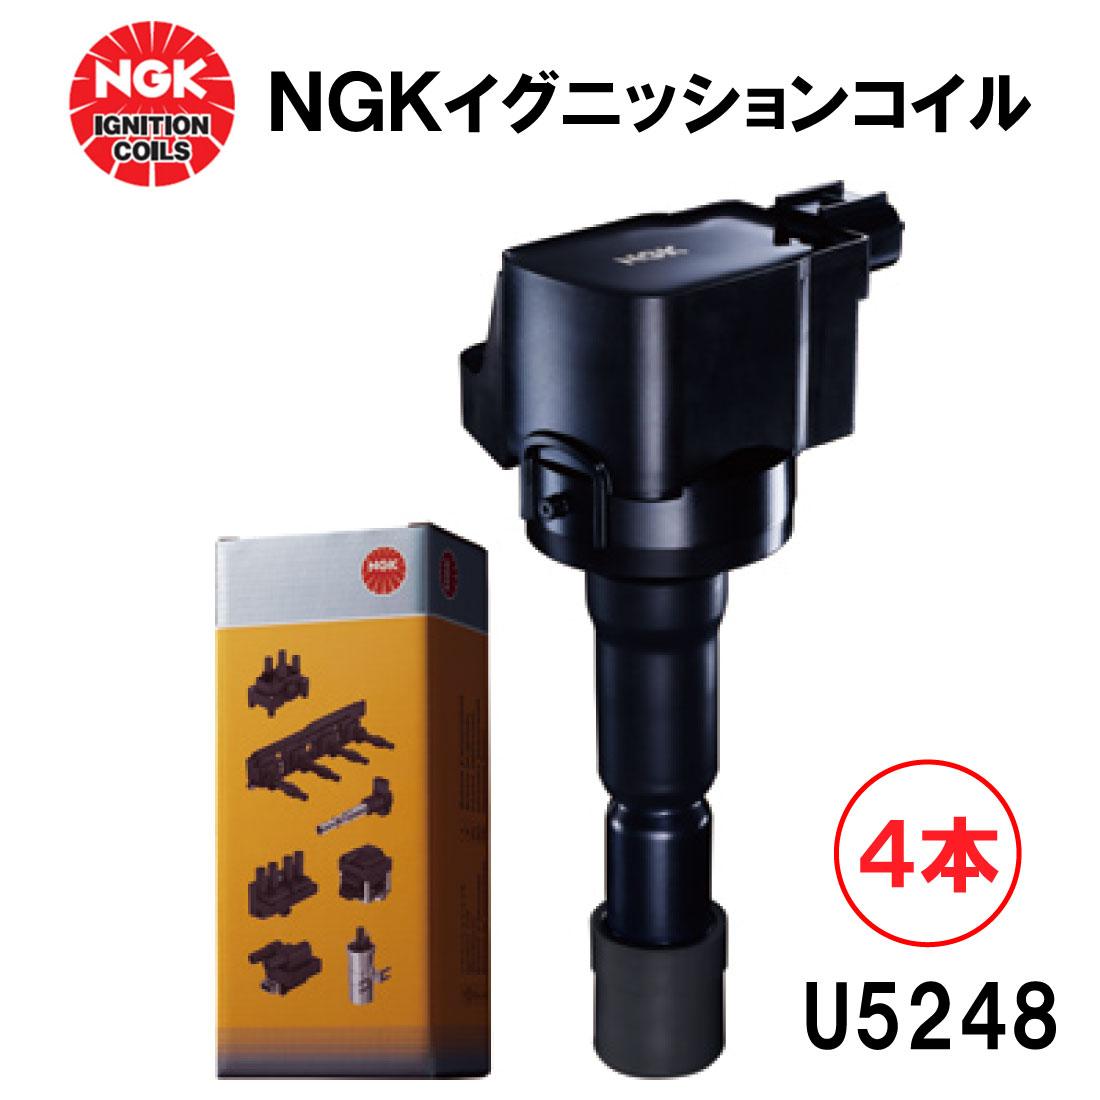 NGK イグニッションコイル U5248 4本セット 48910 純正部品番号 19070-97206 ダイハツ コペン ストーリア マックス ムーブ